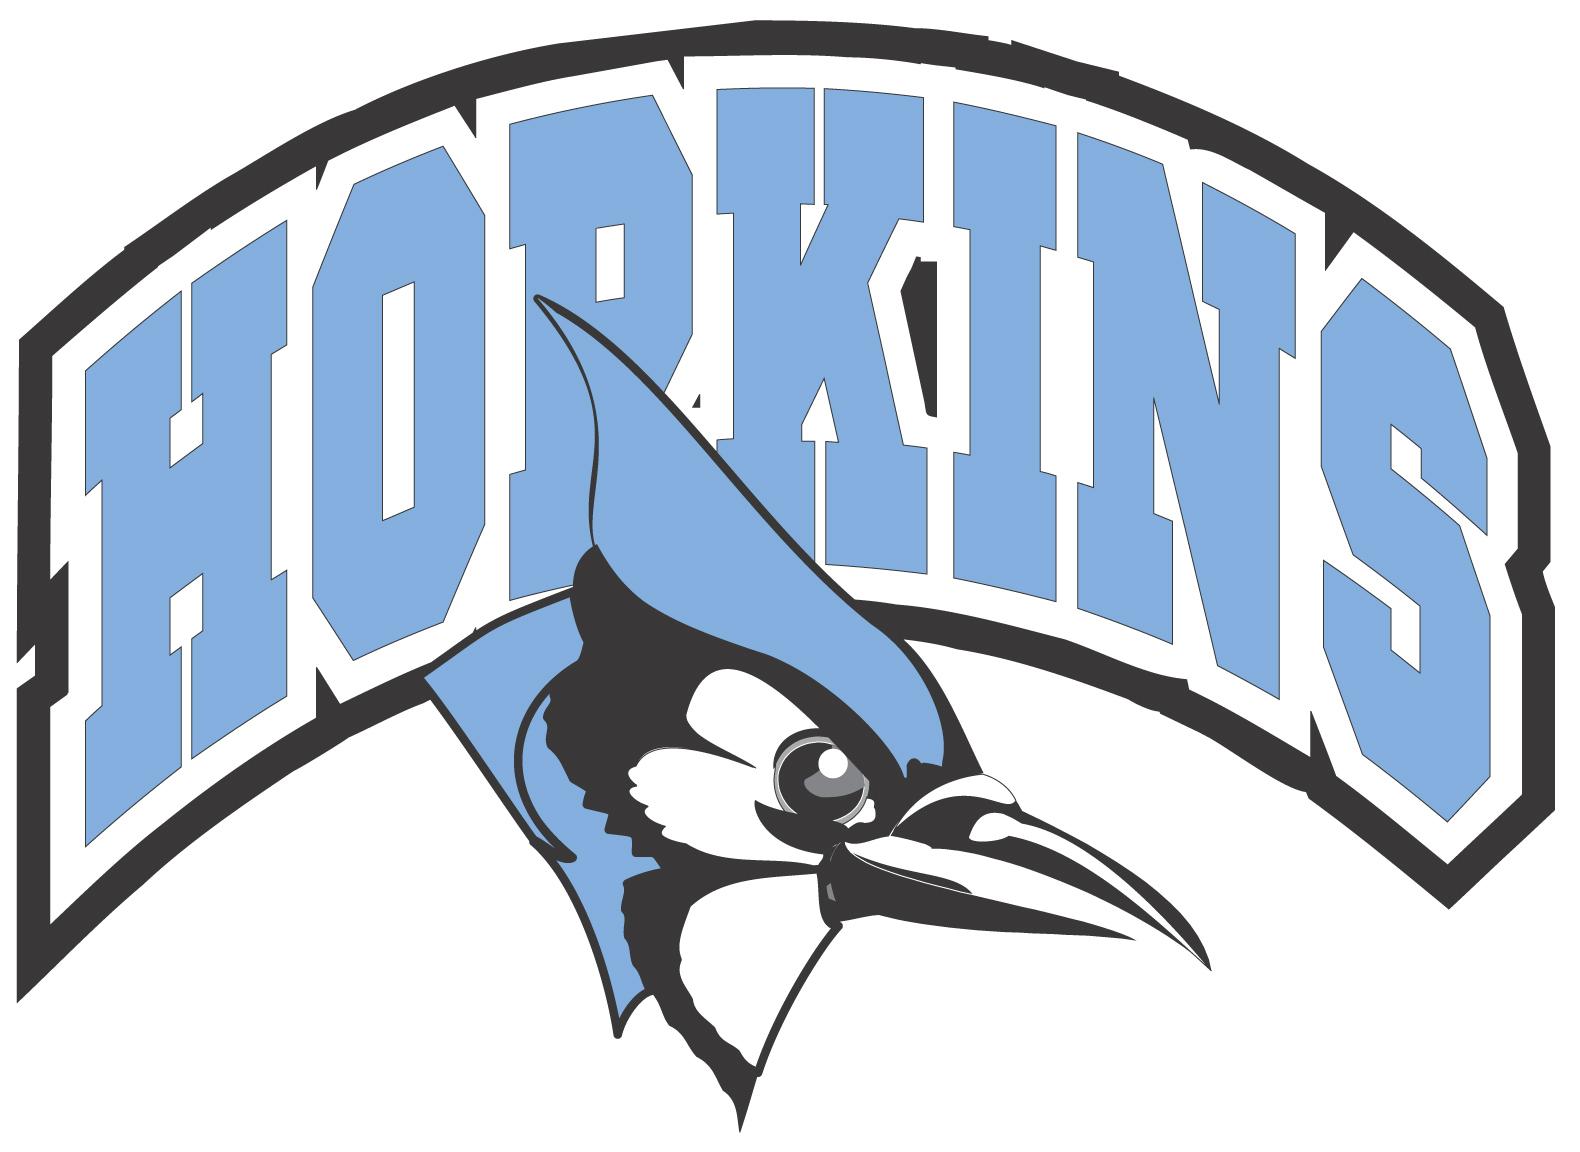 Johns hopkins Logos.